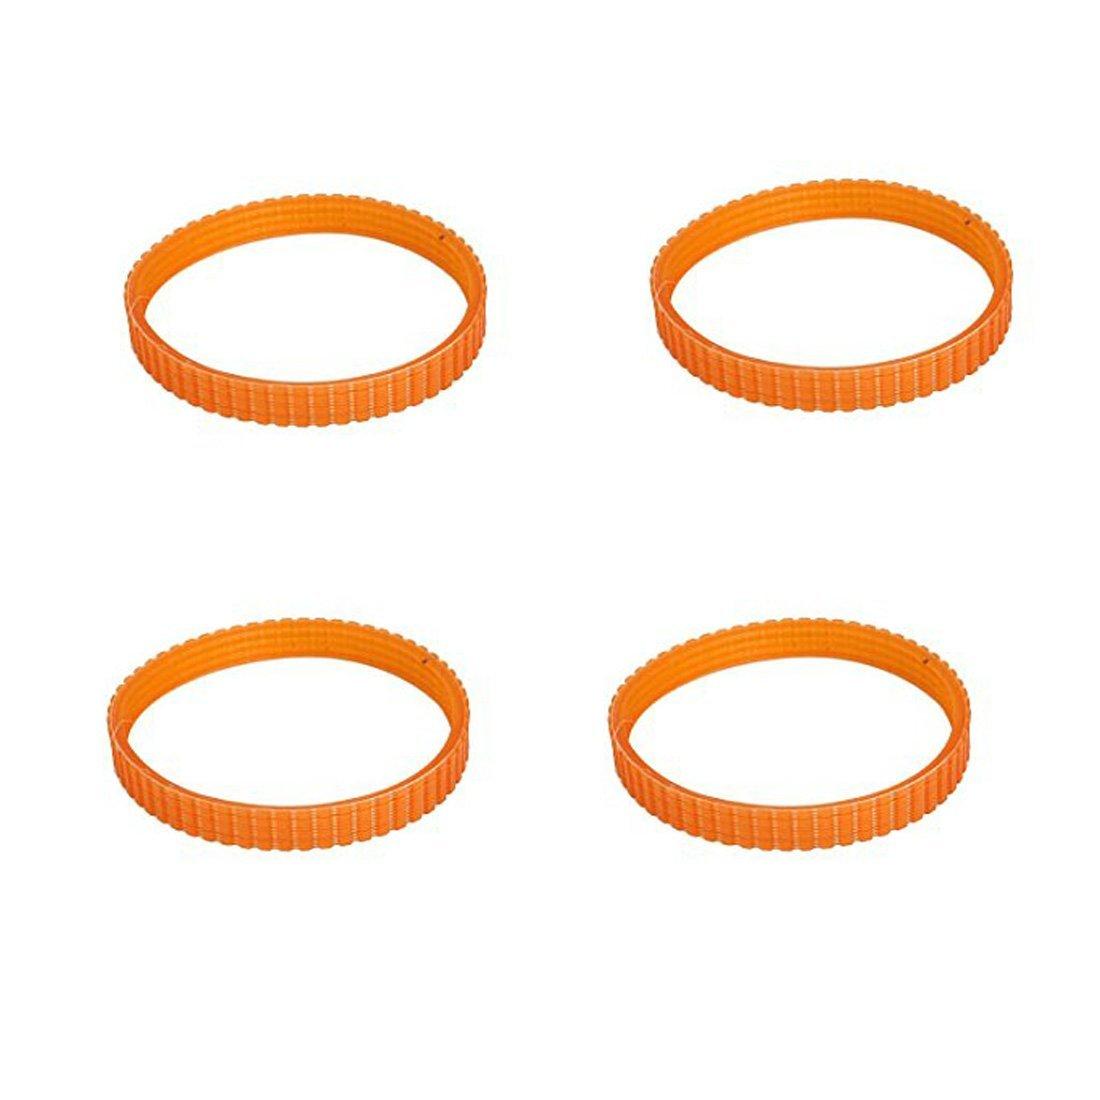 XMHF Electric Planer store Product Drive Orange PU 10mm Width Belt Band 4Pcs